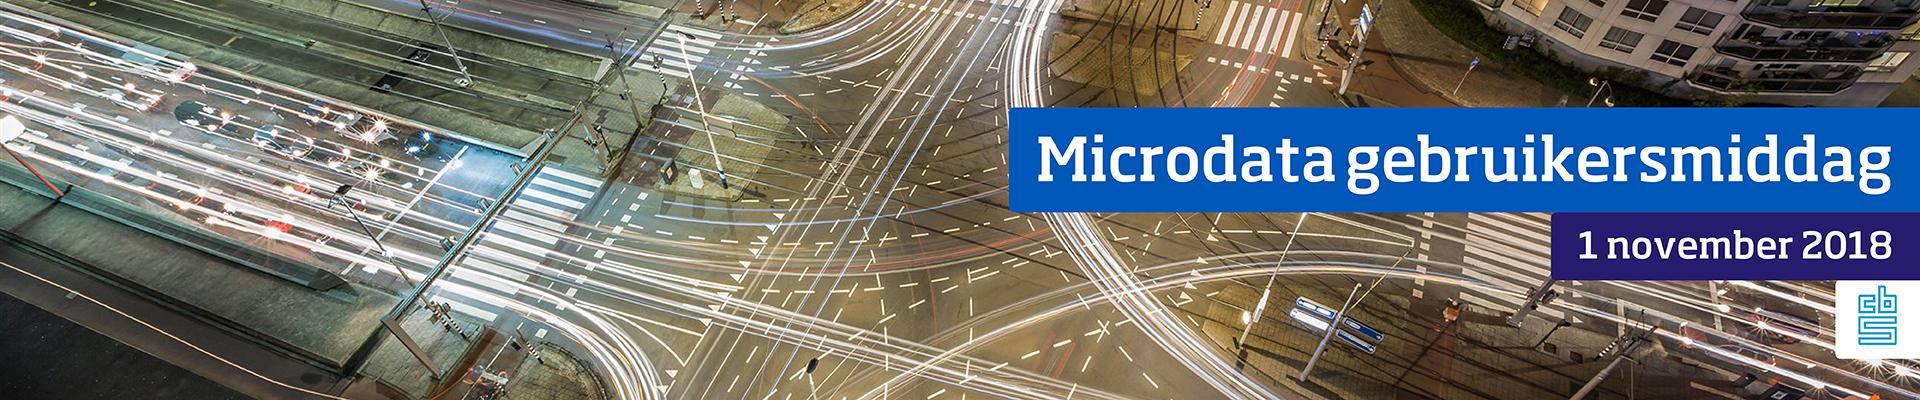 Microdatagebruikersmiddag